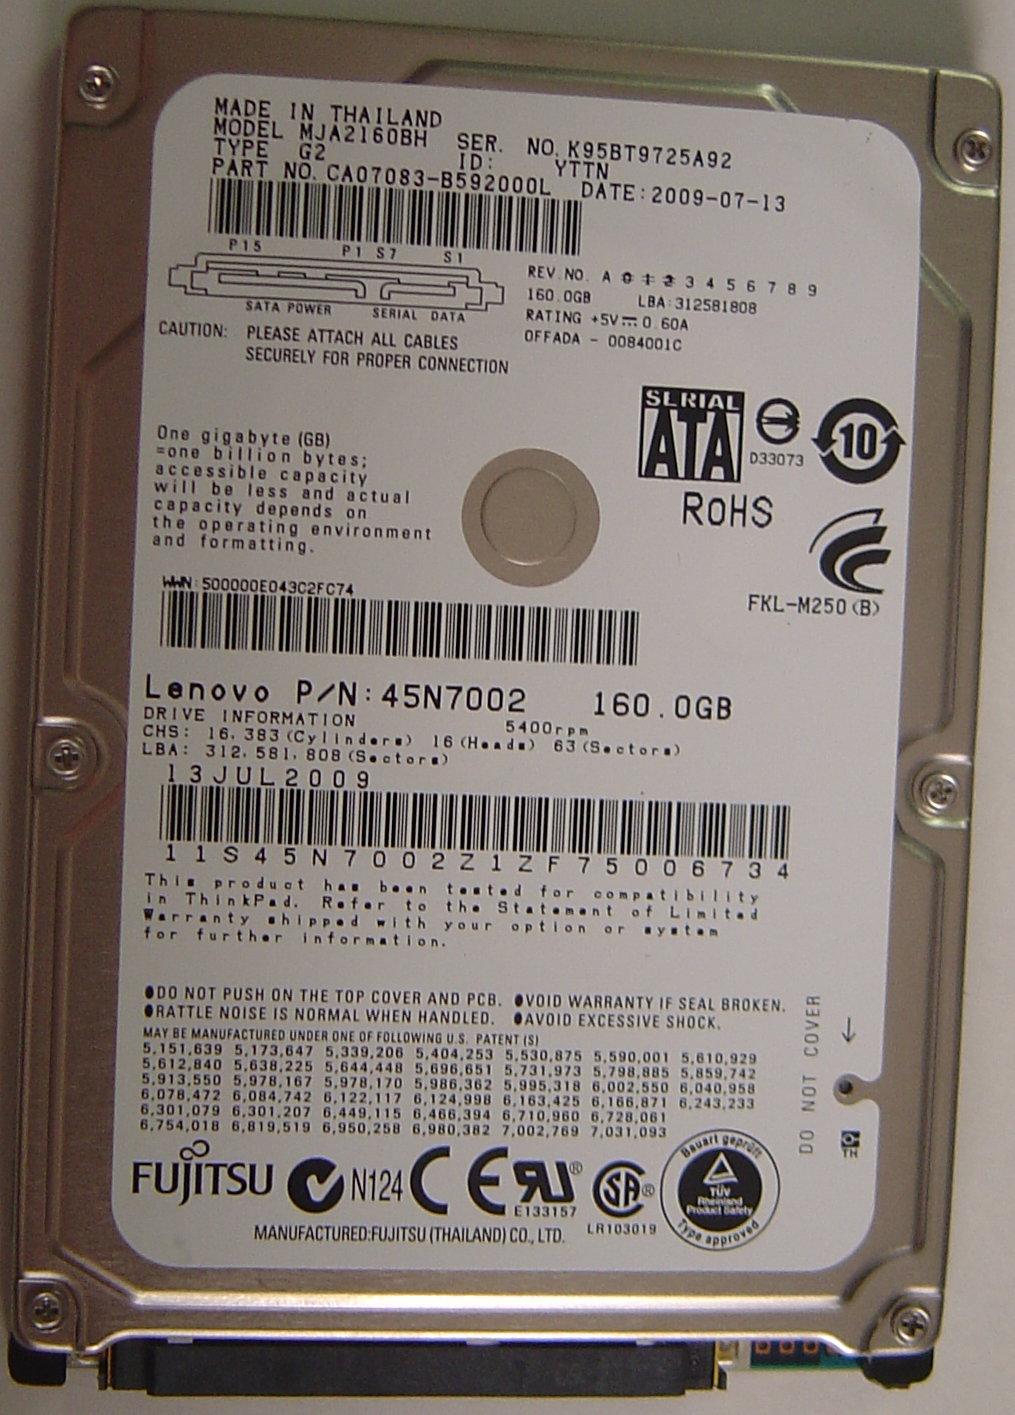 Fujitsu MJA2160BH_NEW